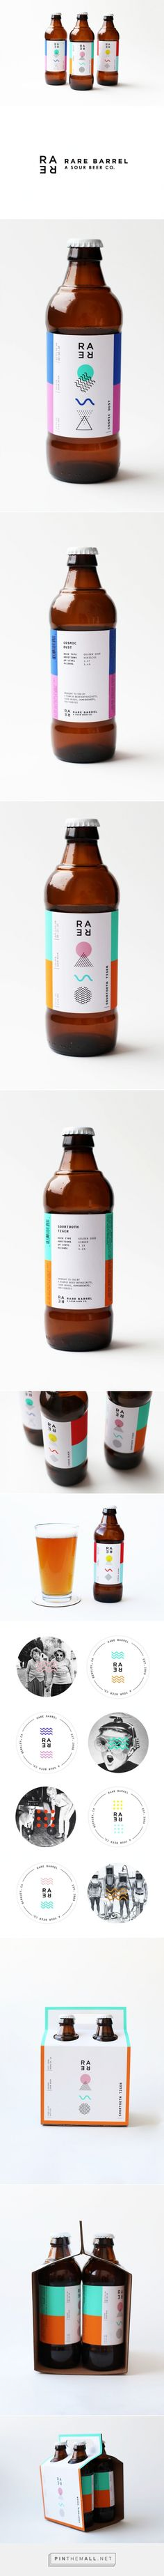 Rare Barrel Sour #Beer Co. #packaging by Mackenzie Freemire - http://www.packagingoftheworld.com/2015/02/rare-barrel-sour-beer-co.html